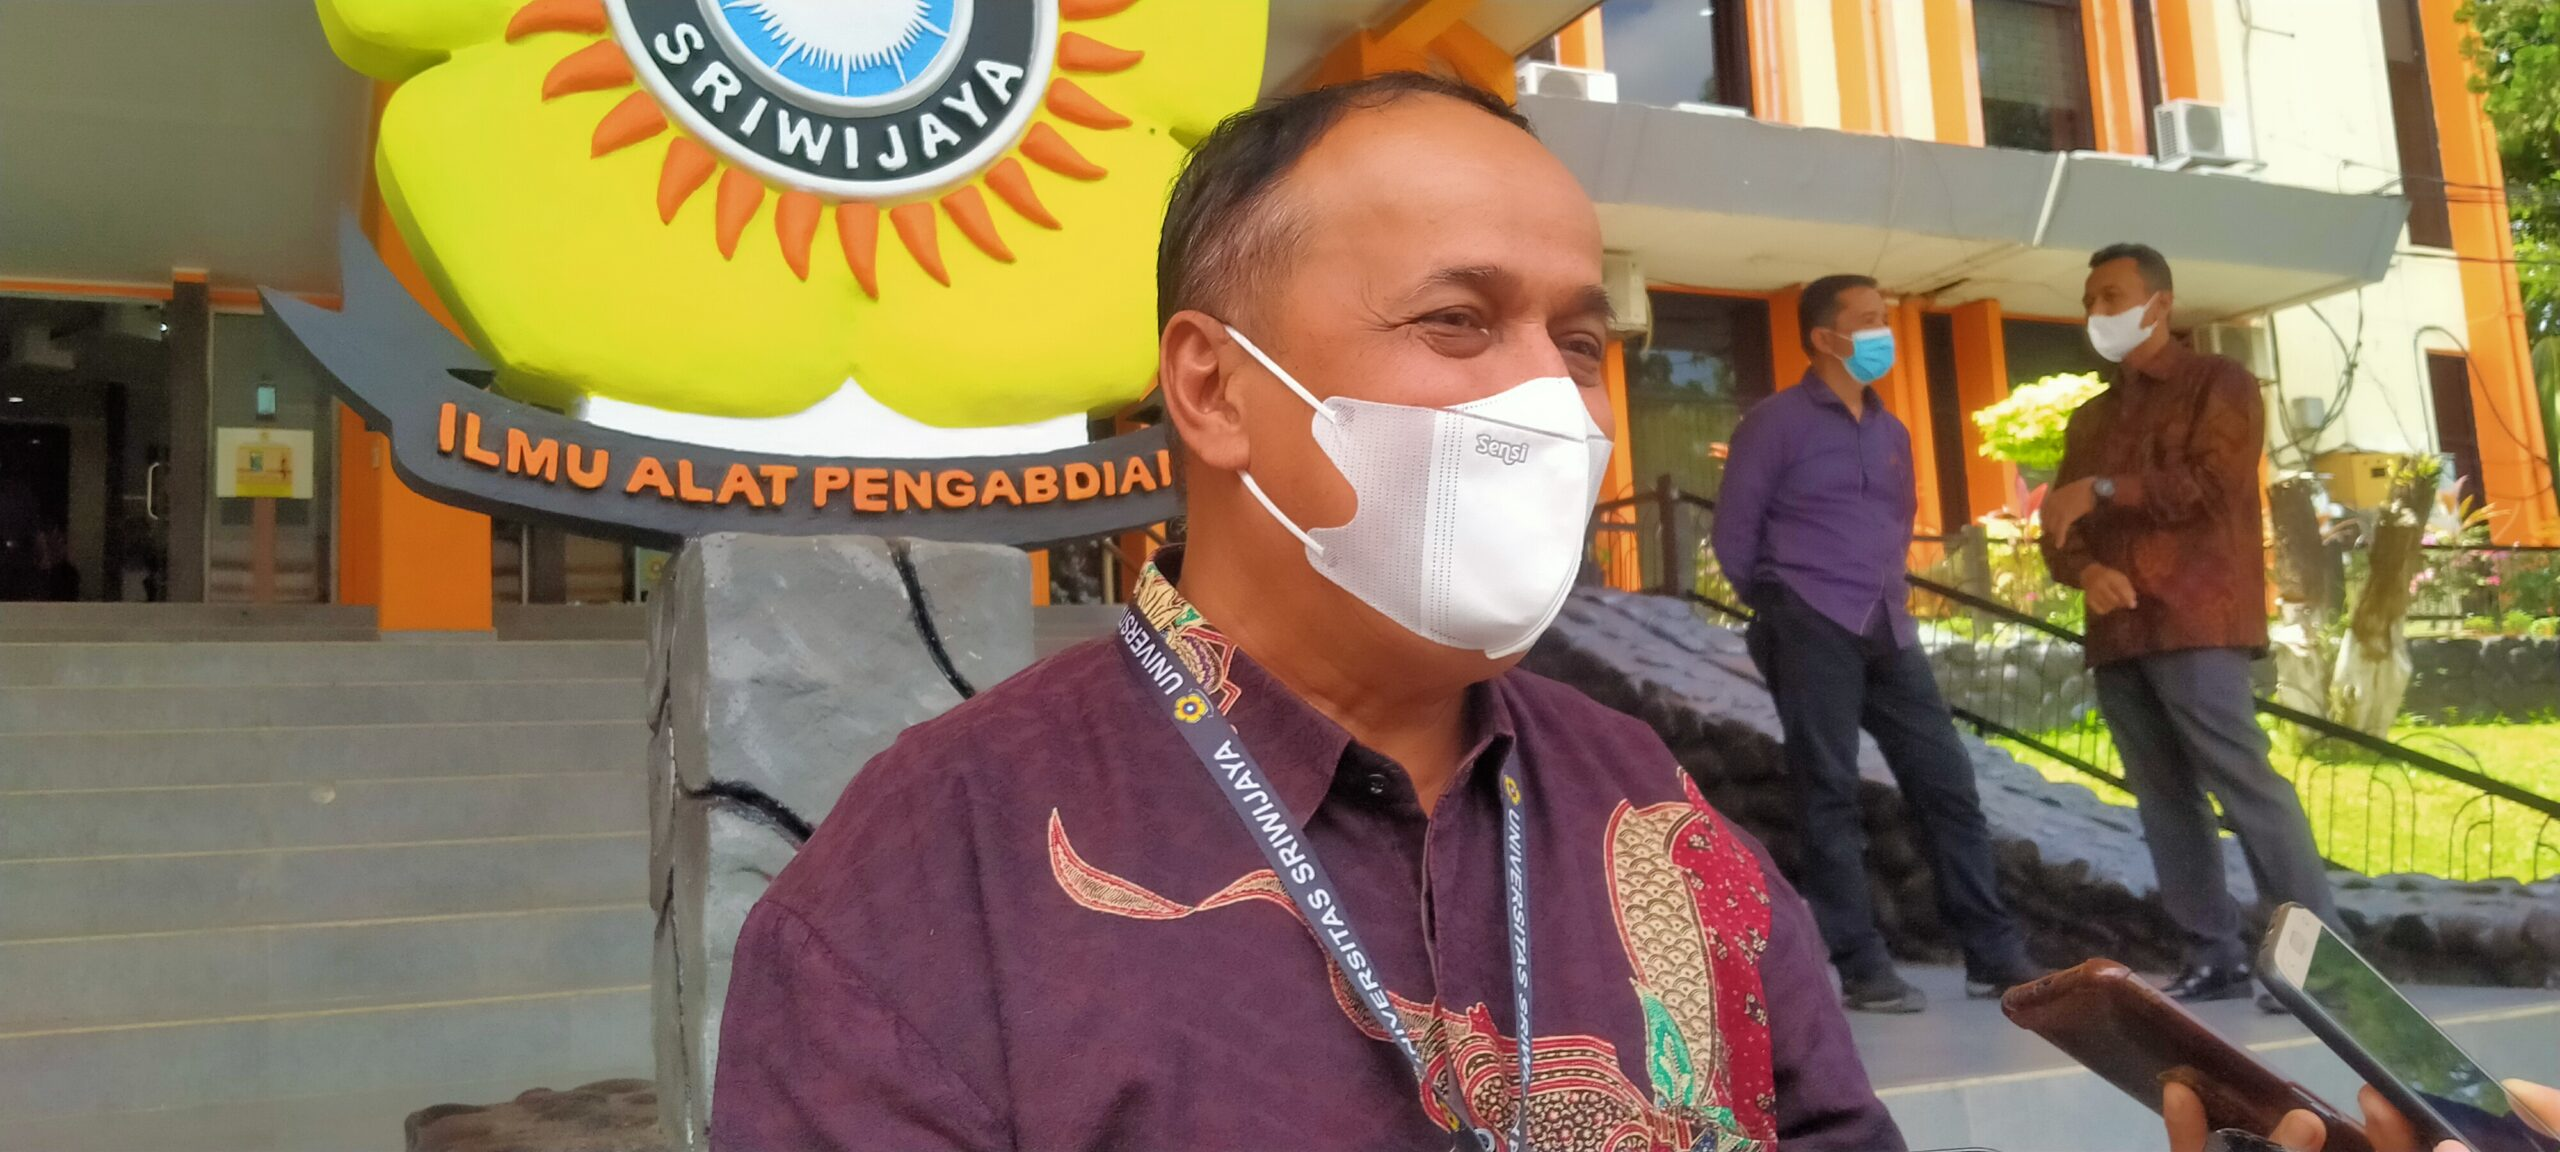 Rektor universitas Sriwijaya Prof Dr Ir Anes Saggaf